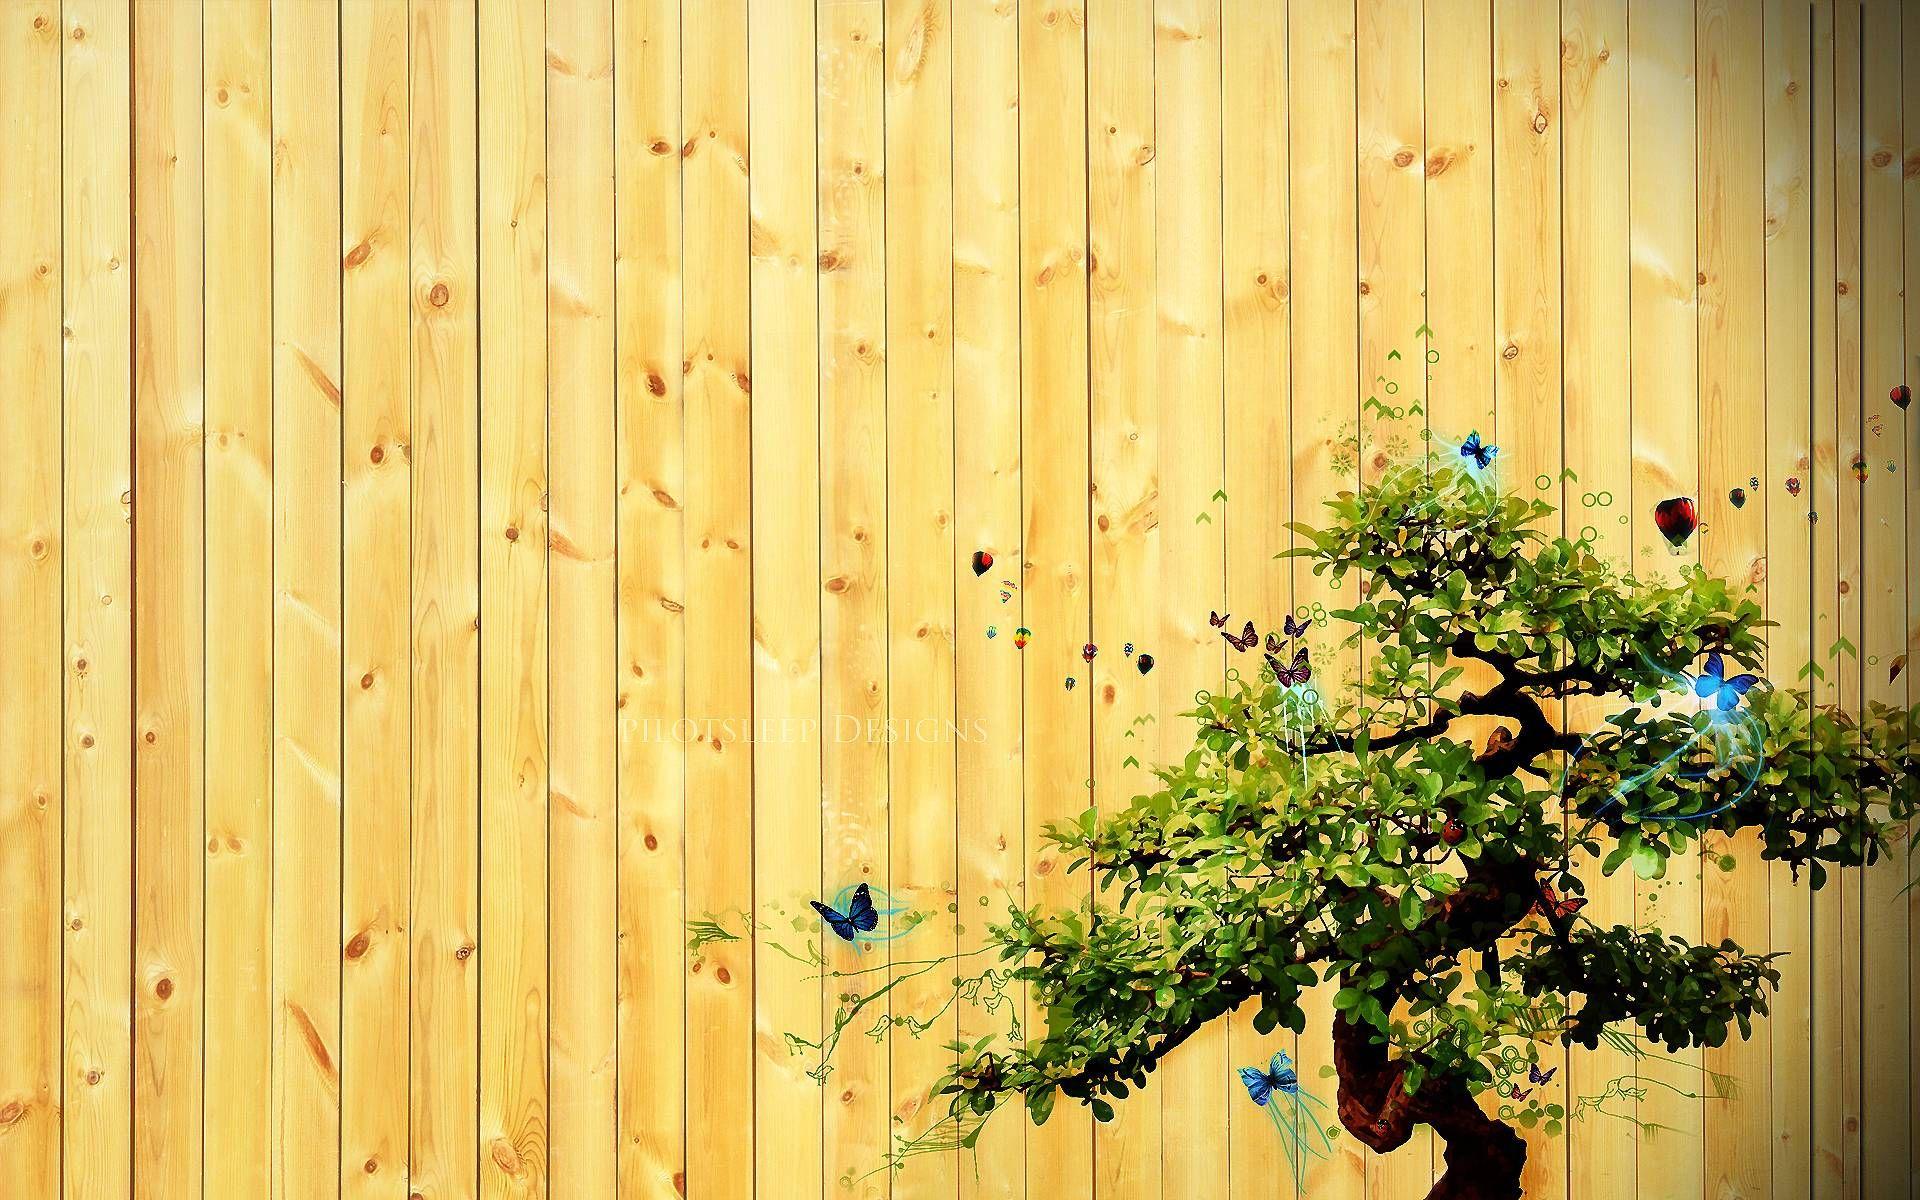 7 best backgrounds images on pinterest adobe photoshop album design and background images